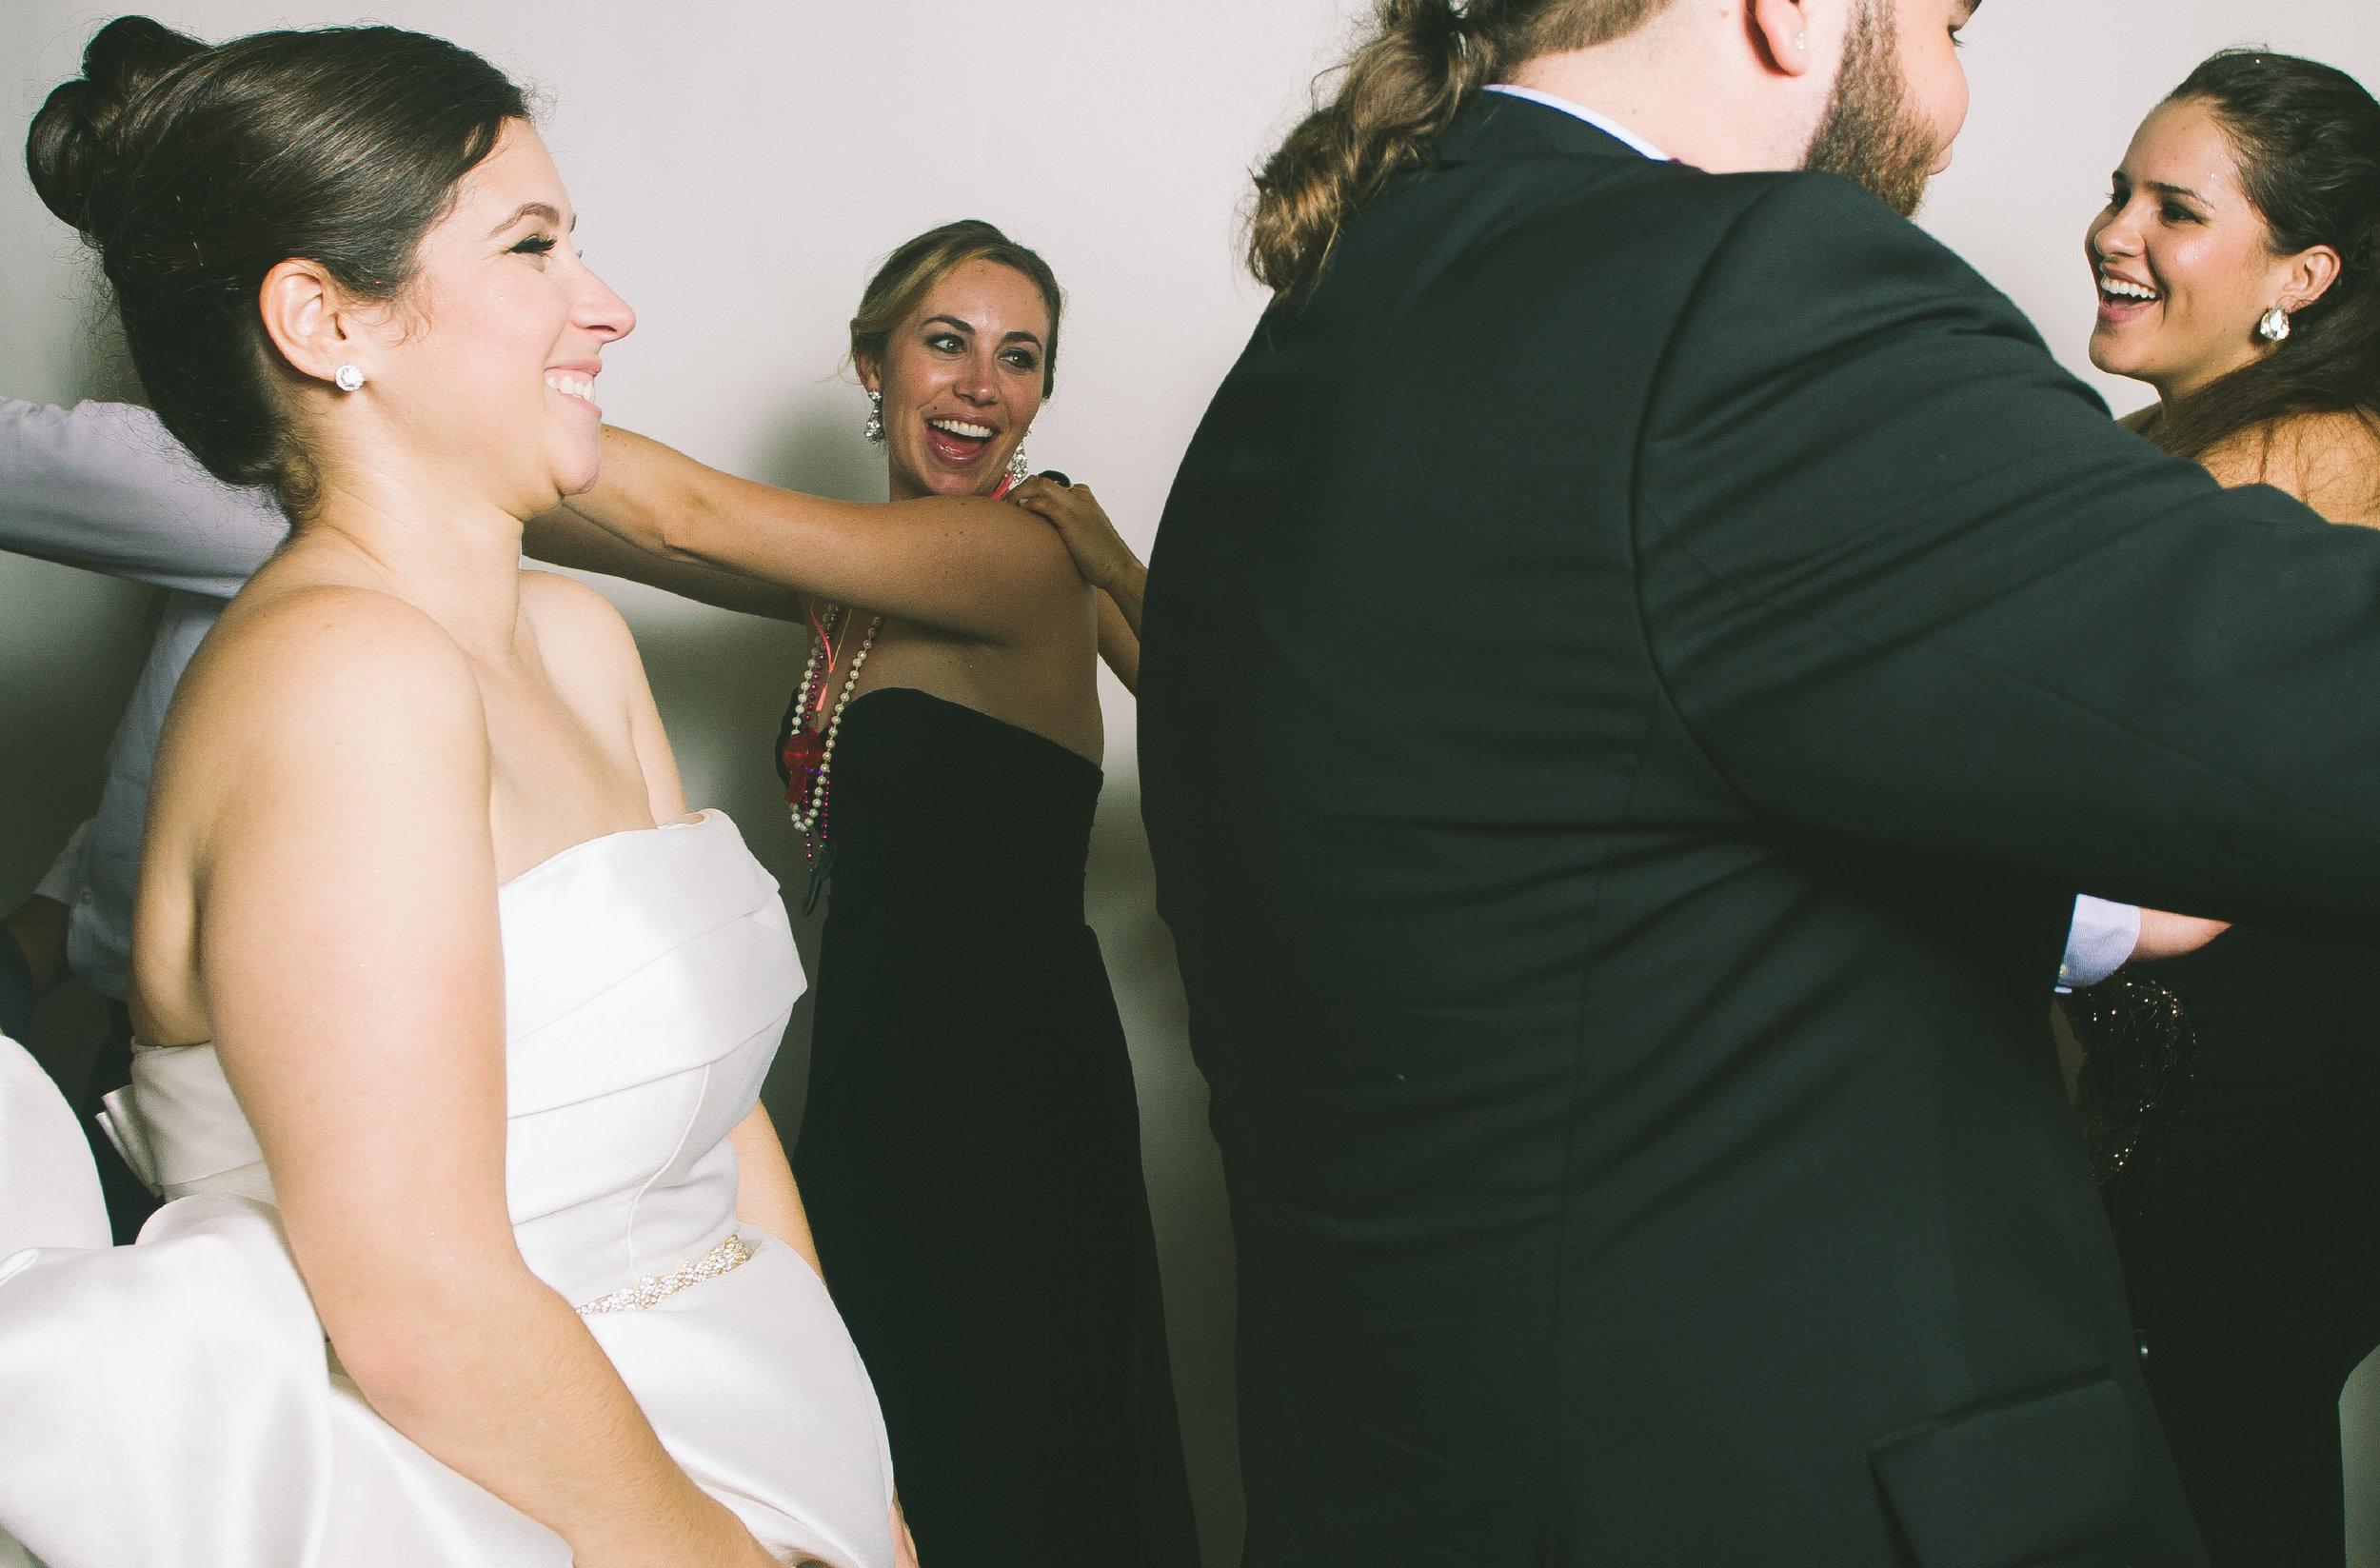 Marelys + Oscar Wedding Wackybooth Photobooth44.jpg